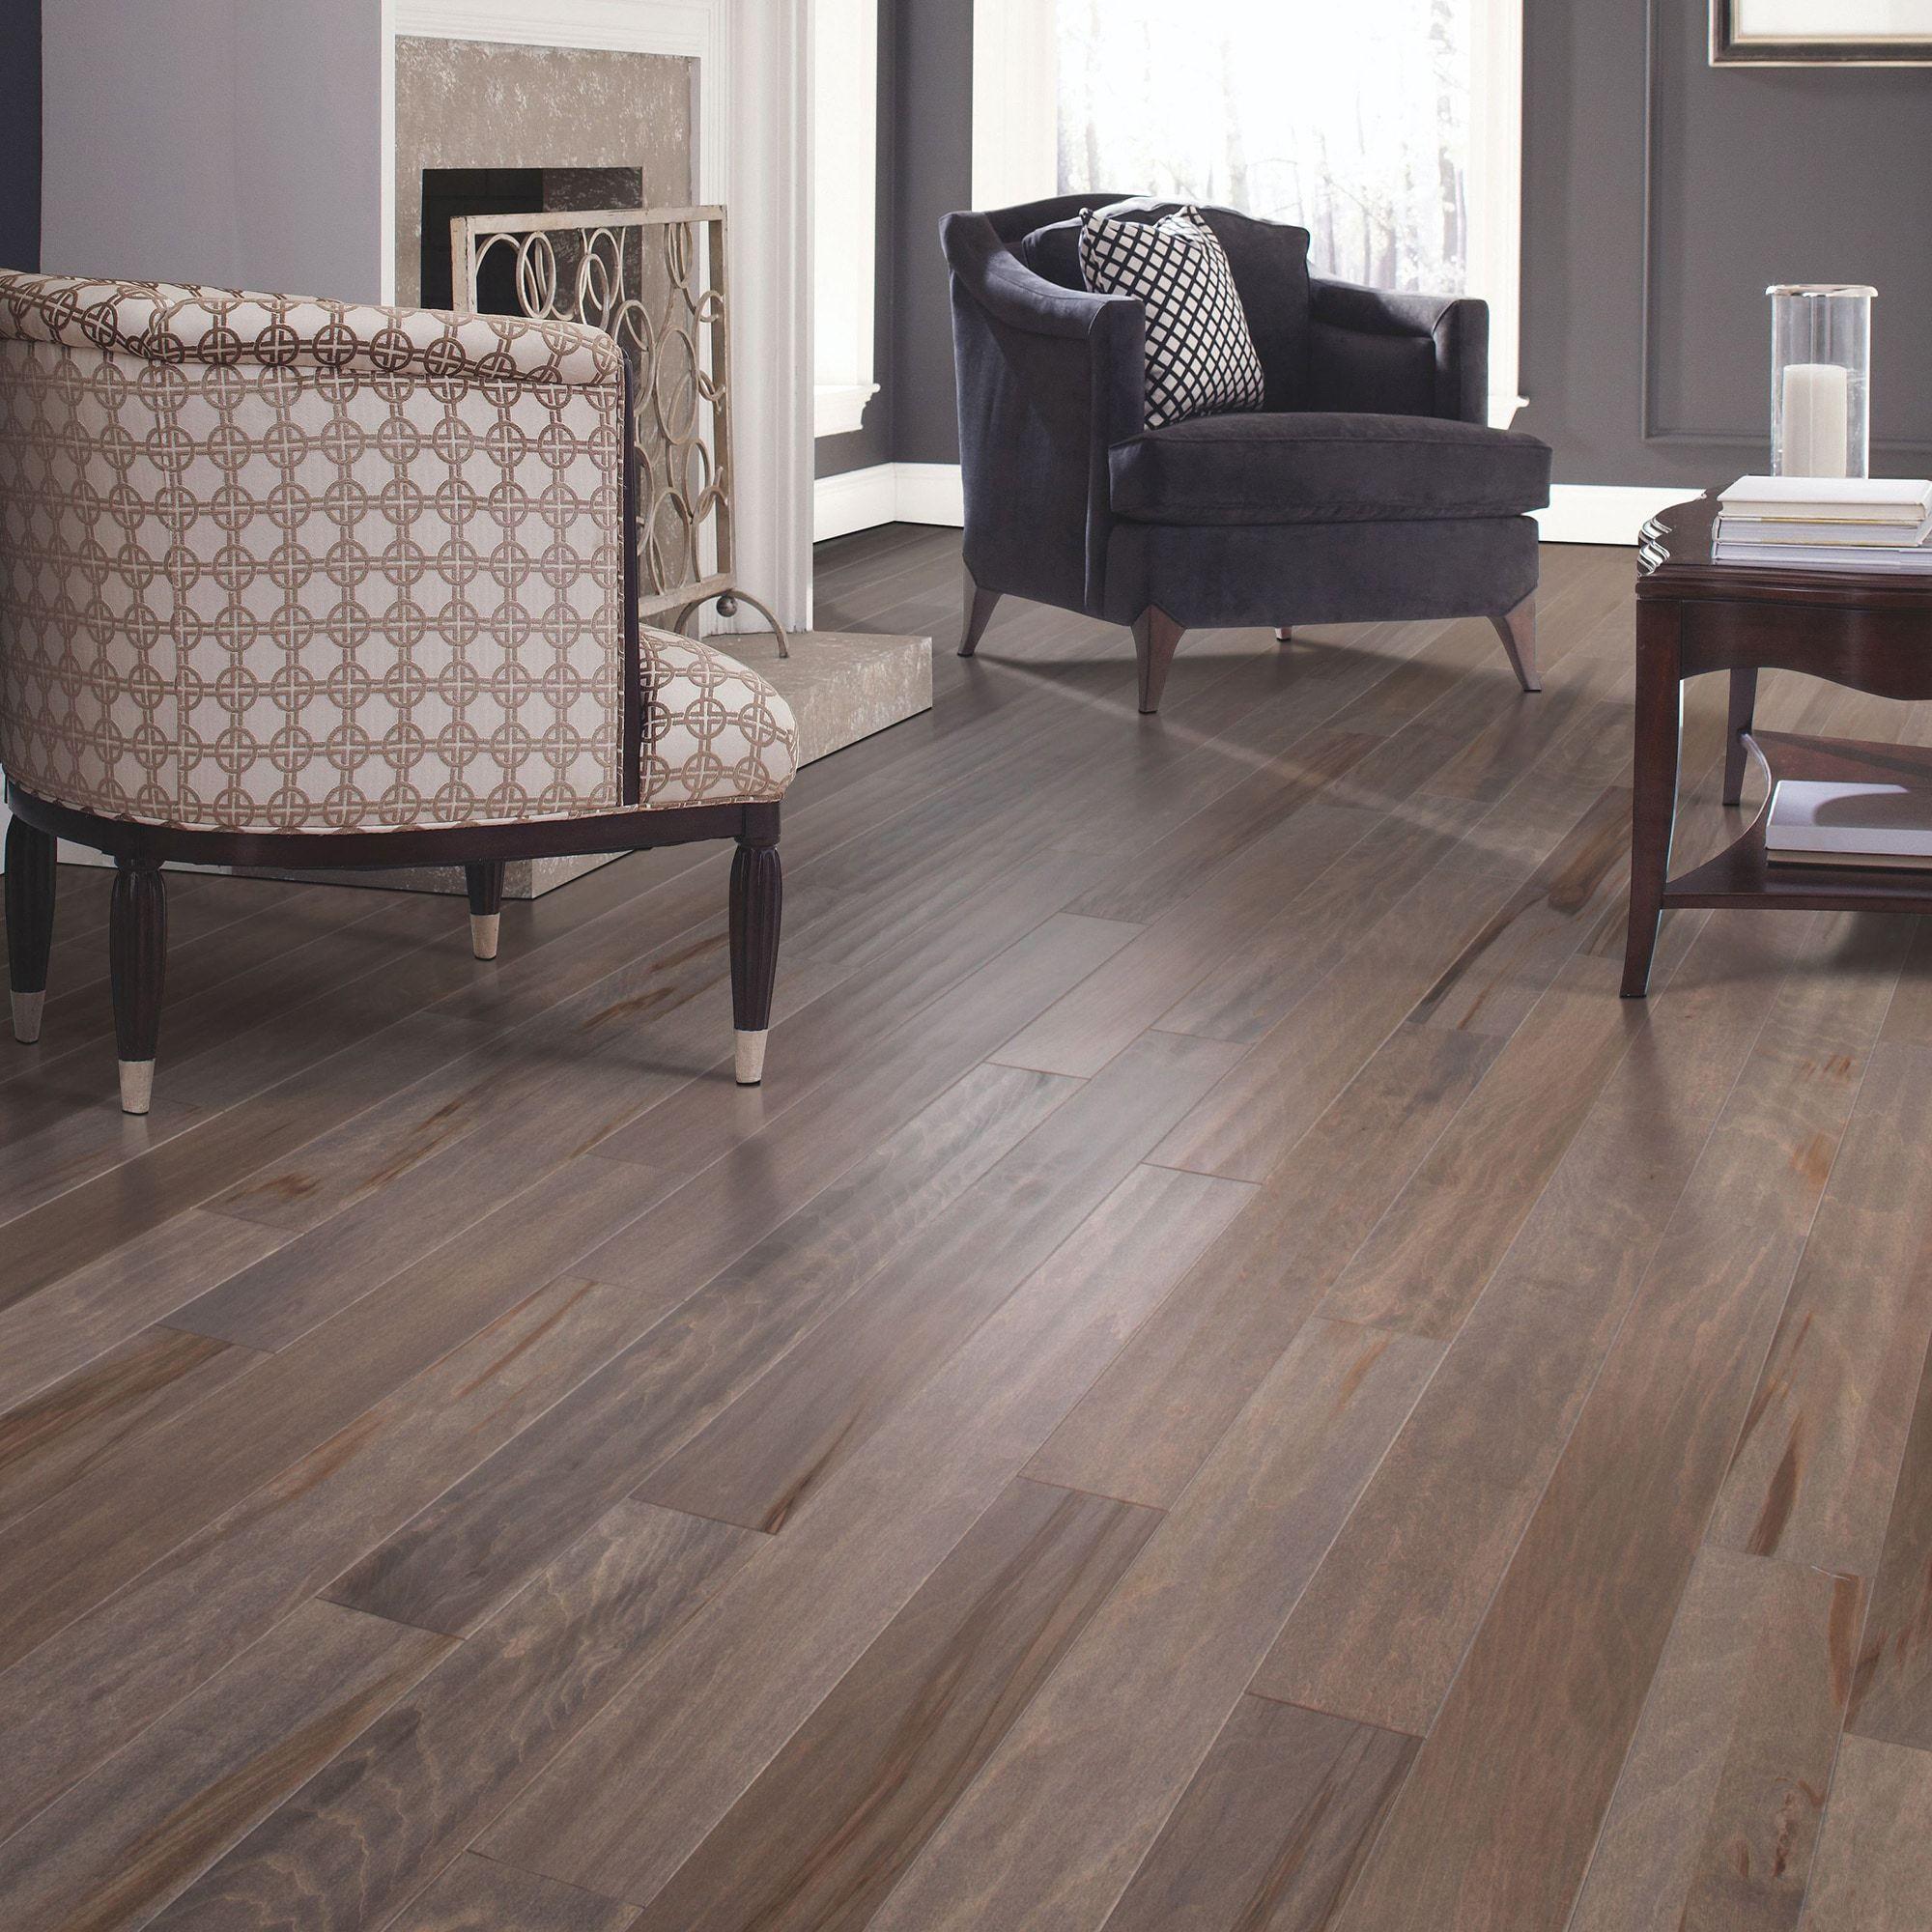 4 Inch Oak Hardwood Flooring Of Builddirecta Mohawk Flooring Engineered Hardwood Ageless Allure with Regard to Builddirecta Mohawk Flooring Engineered Hardwood Ageless Allure Collection